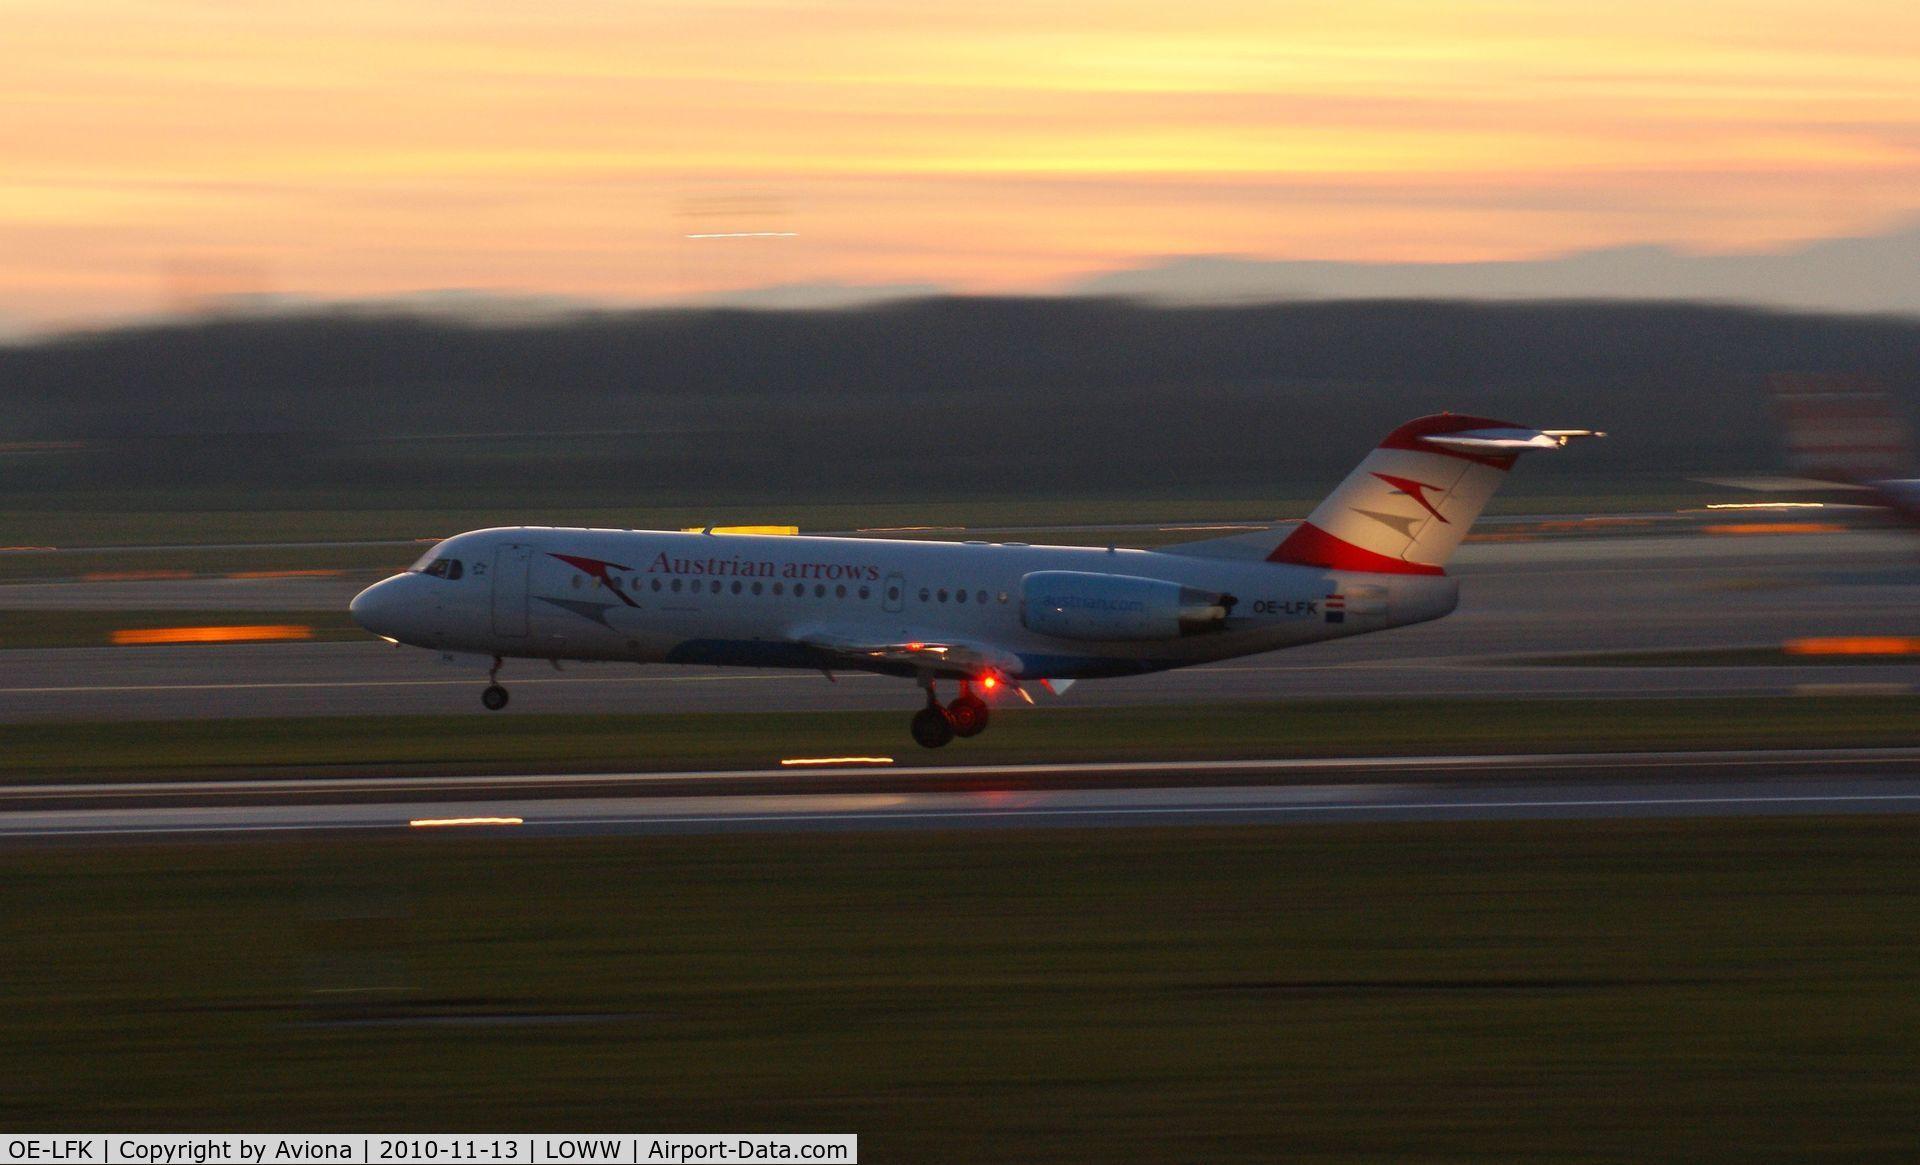 OE-LFK, 1995 Fokker 70 (F-28-0070) C/N 11555, OE-LFK @ VIE